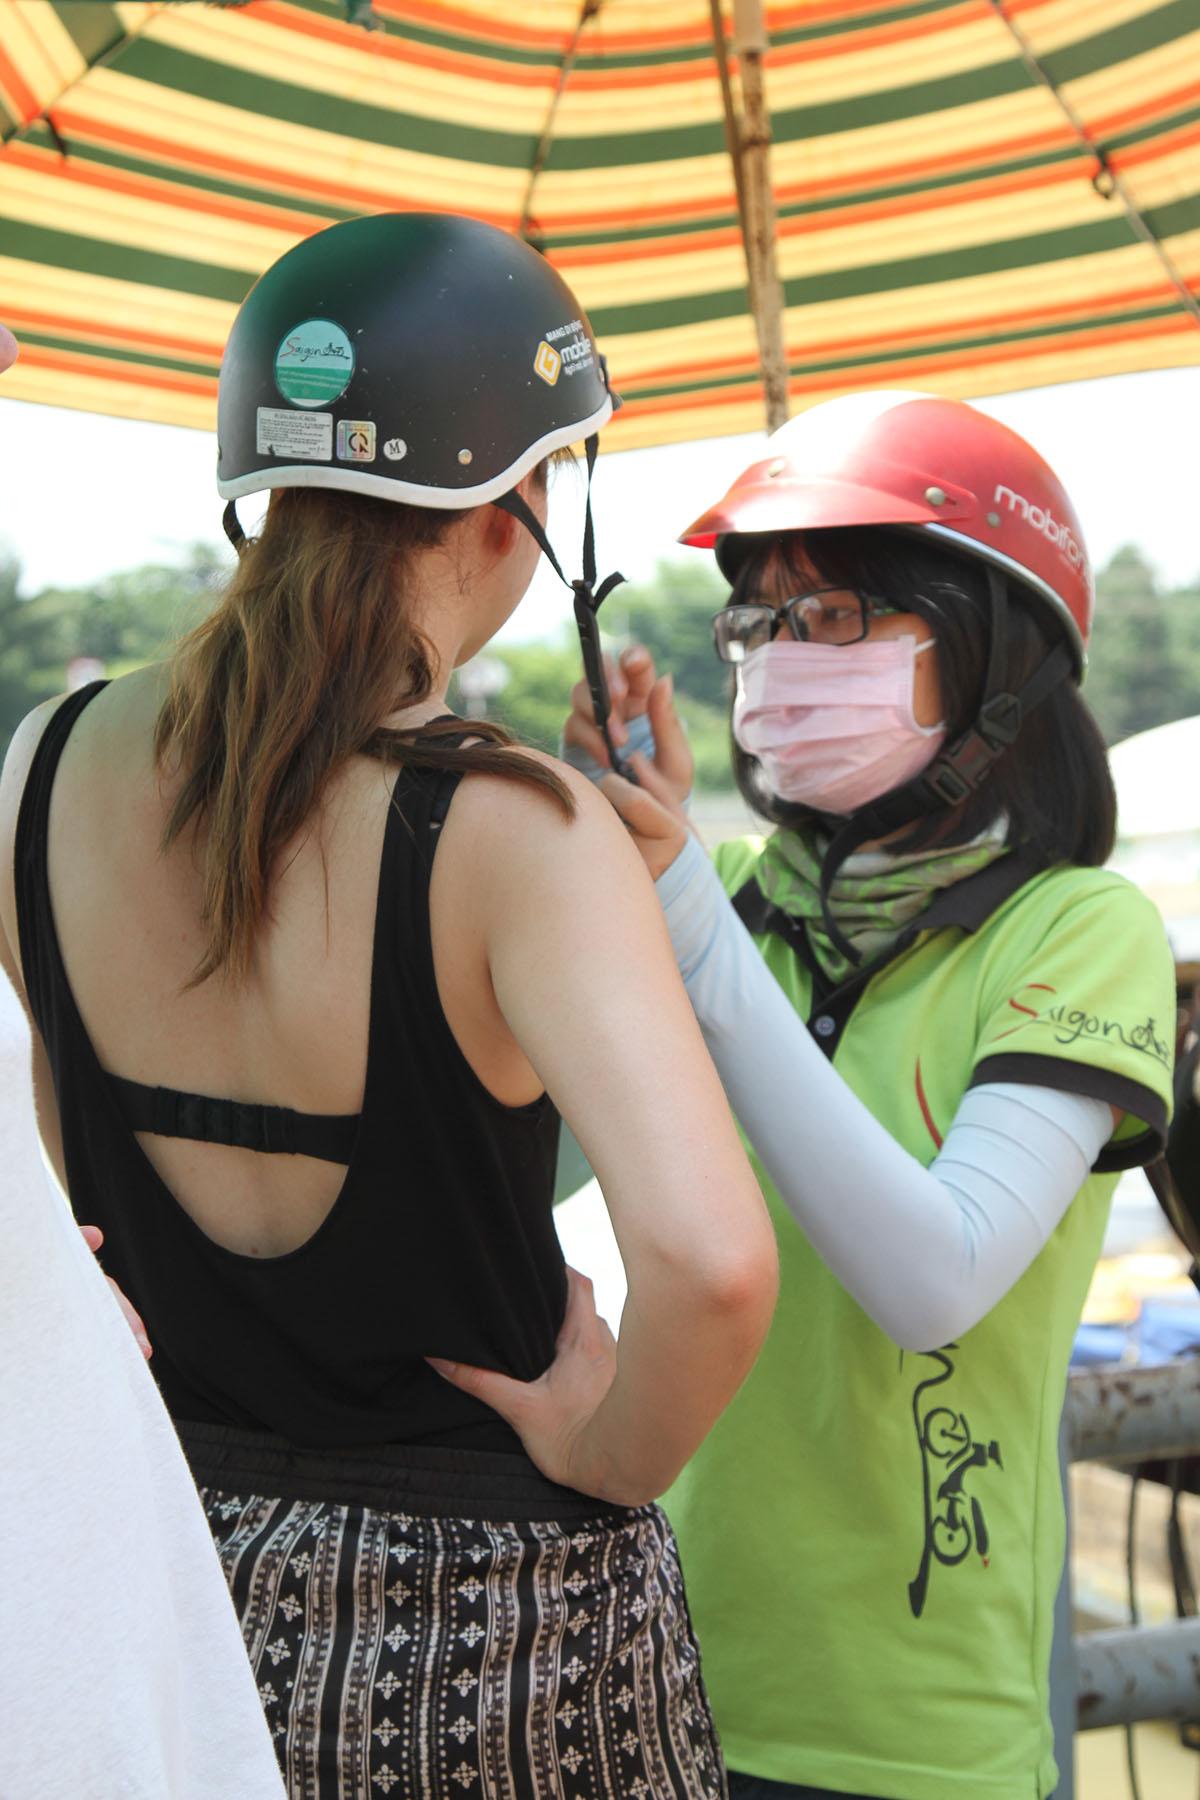 Saigon on motorbike supports tourists bring helmets.